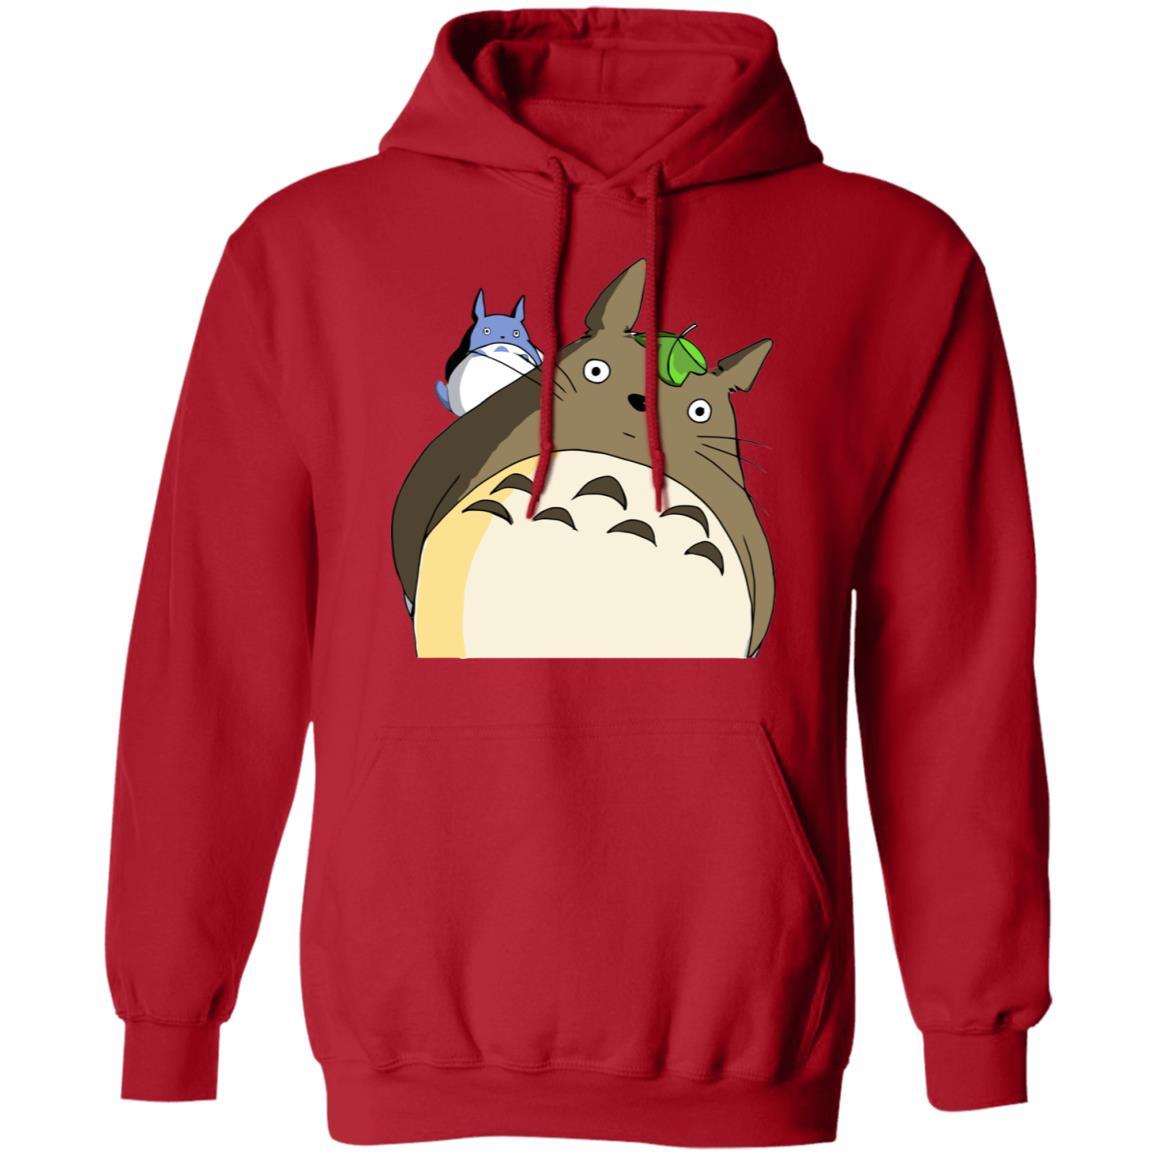 The Curious Totoro Hoodie